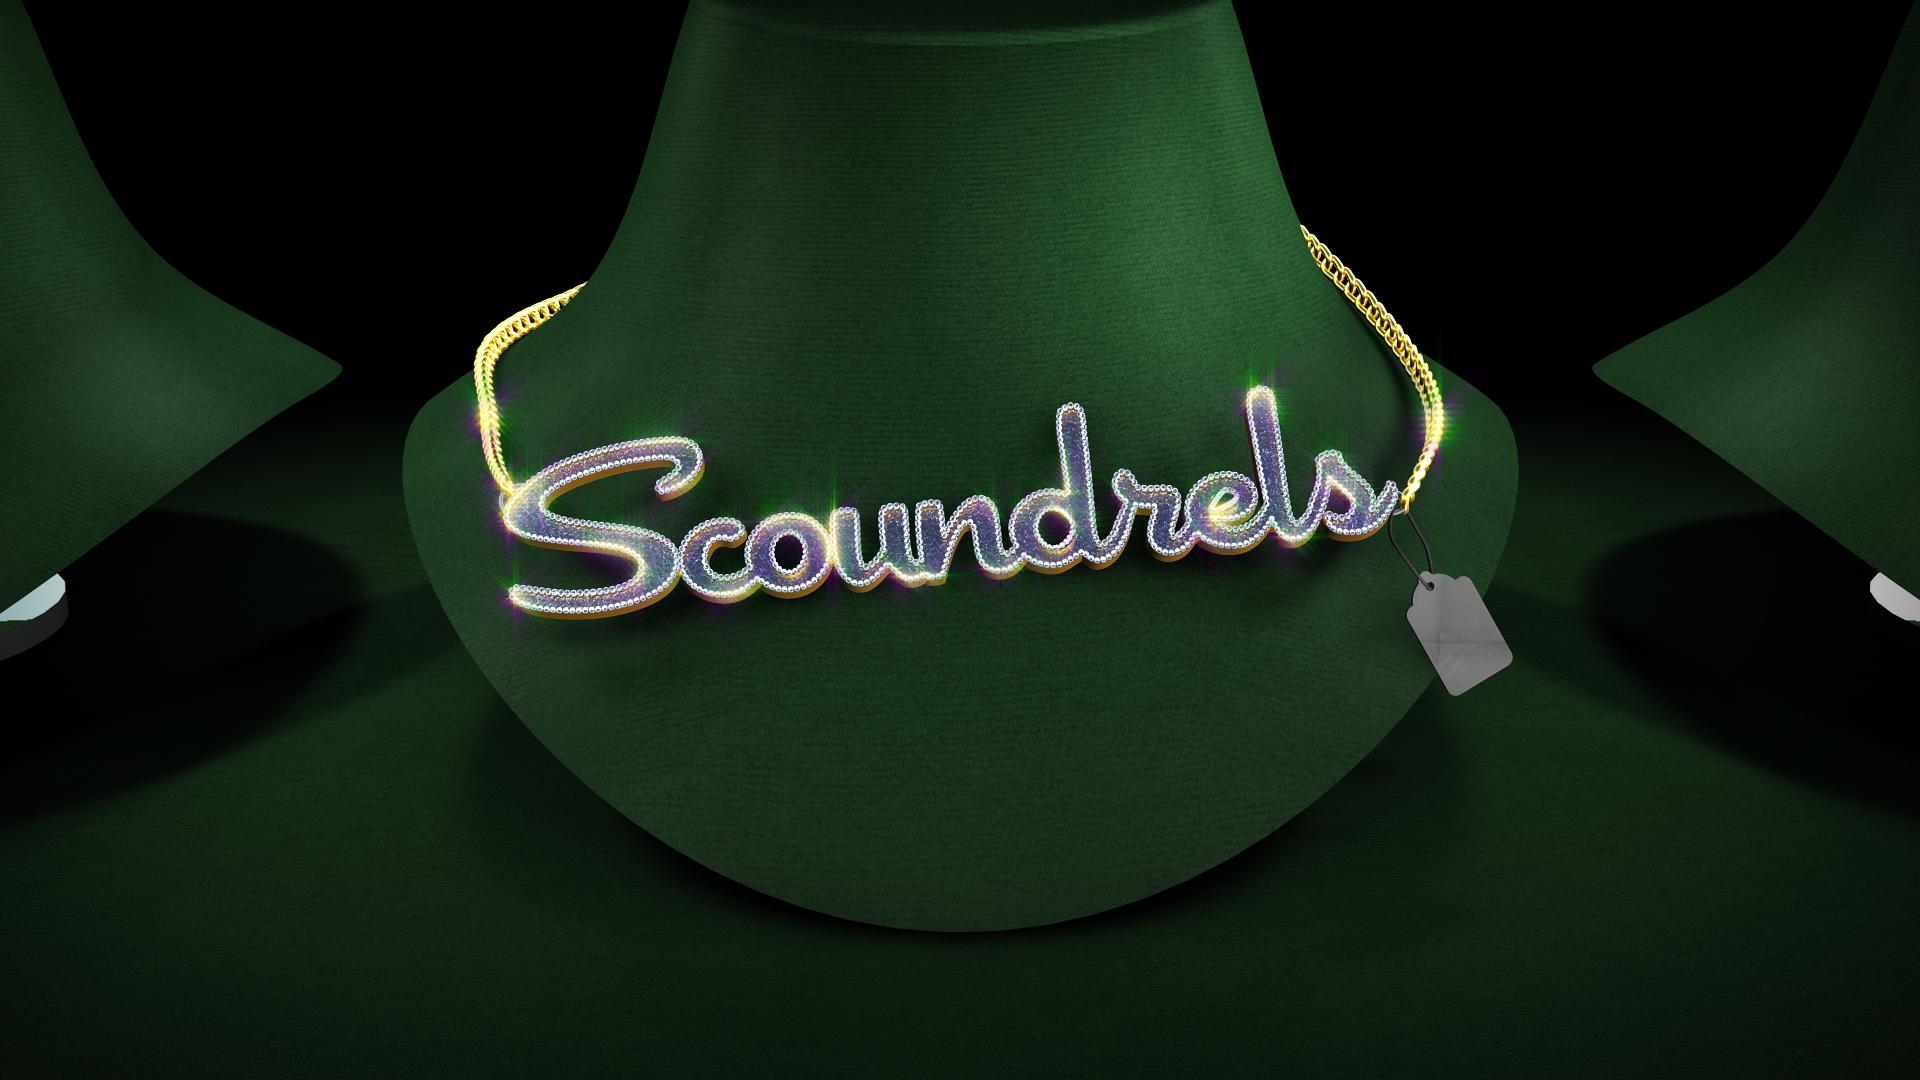 Scoundrels_JewelryBreak_Frm05+(0.00.00.00).jpg